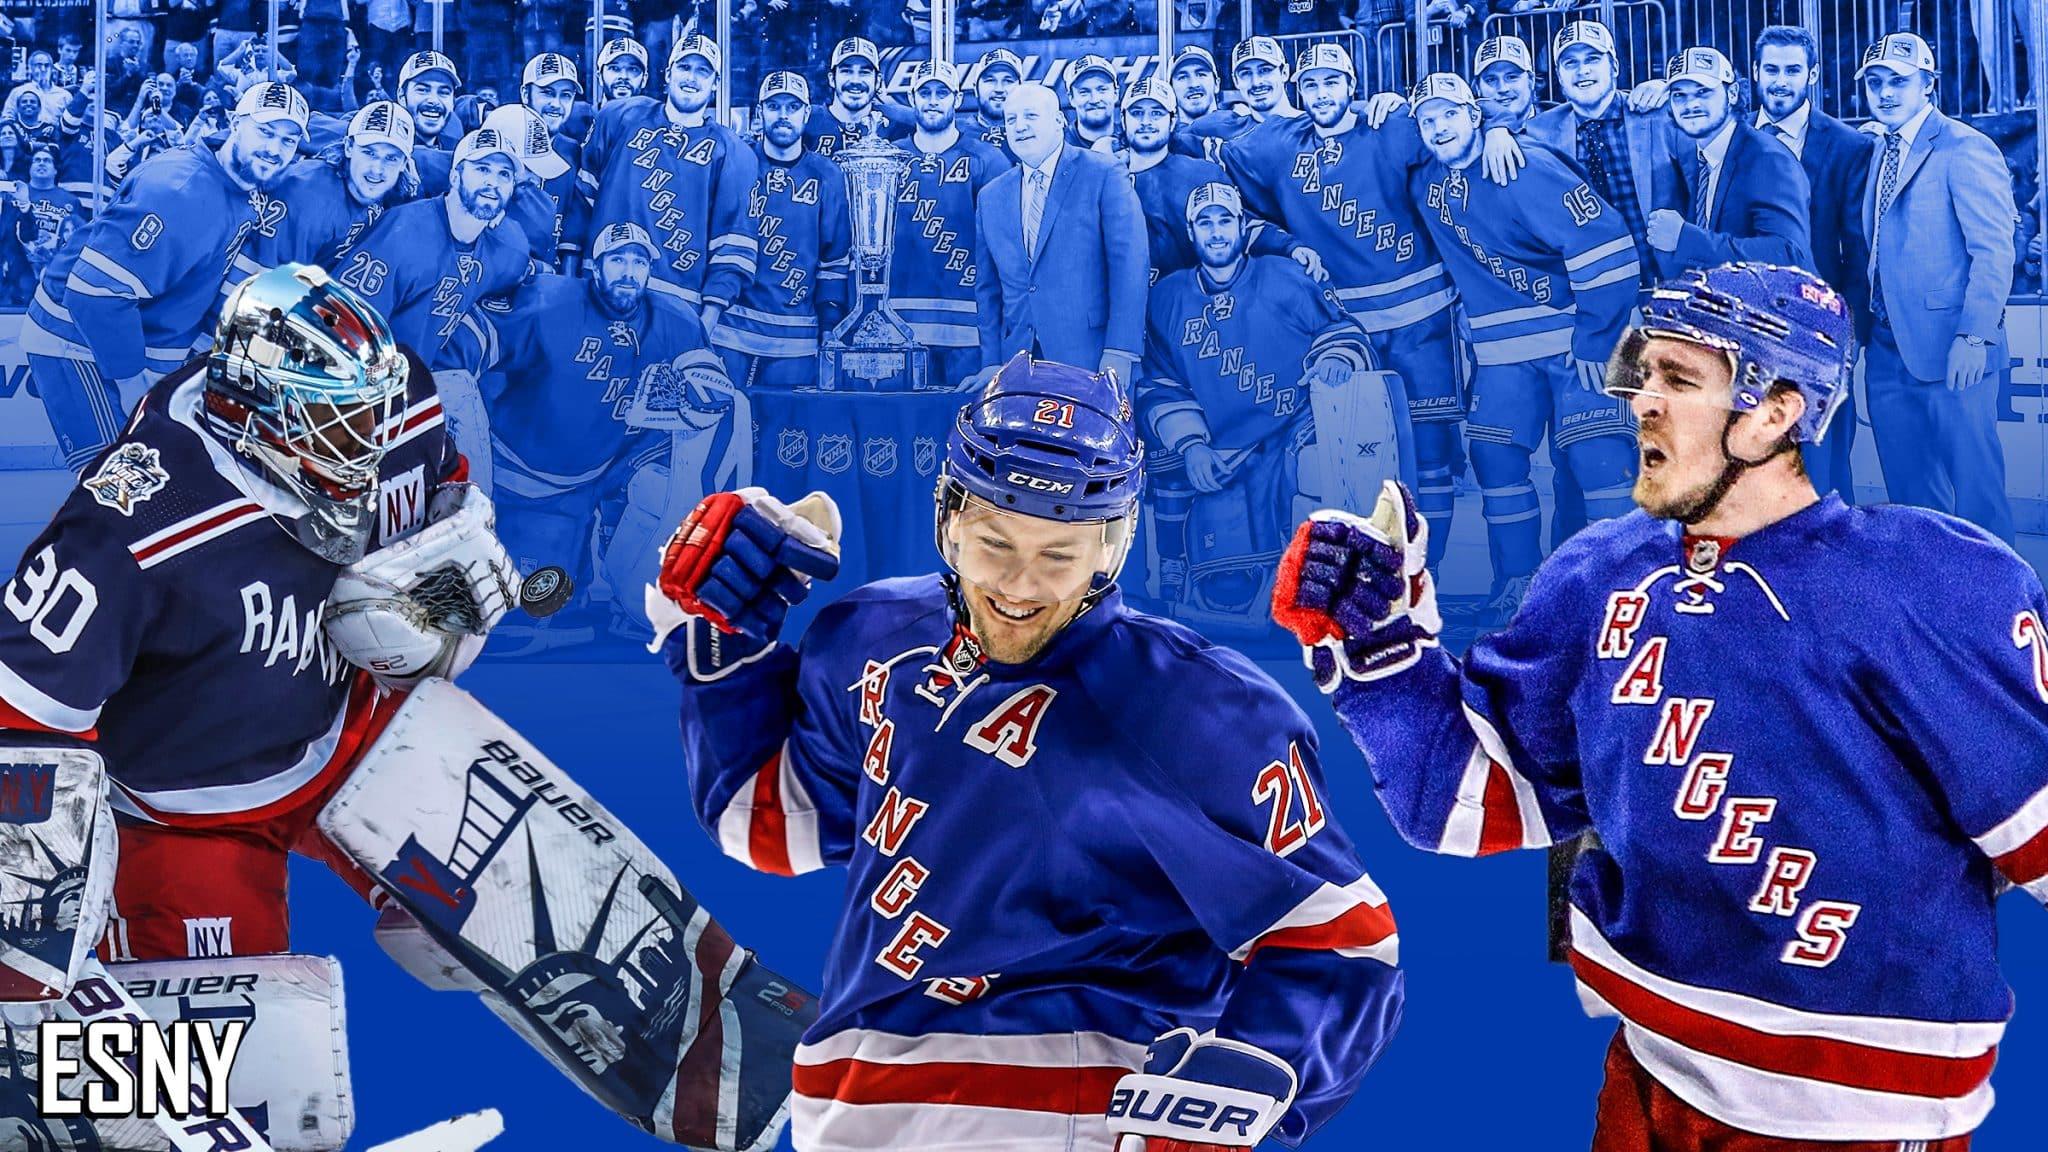 Henrik Lundqvist, Derek Stepan, Ryan Mcdonagh, 2014 - New York Rangers , HD Wallpaper & Backgrounds